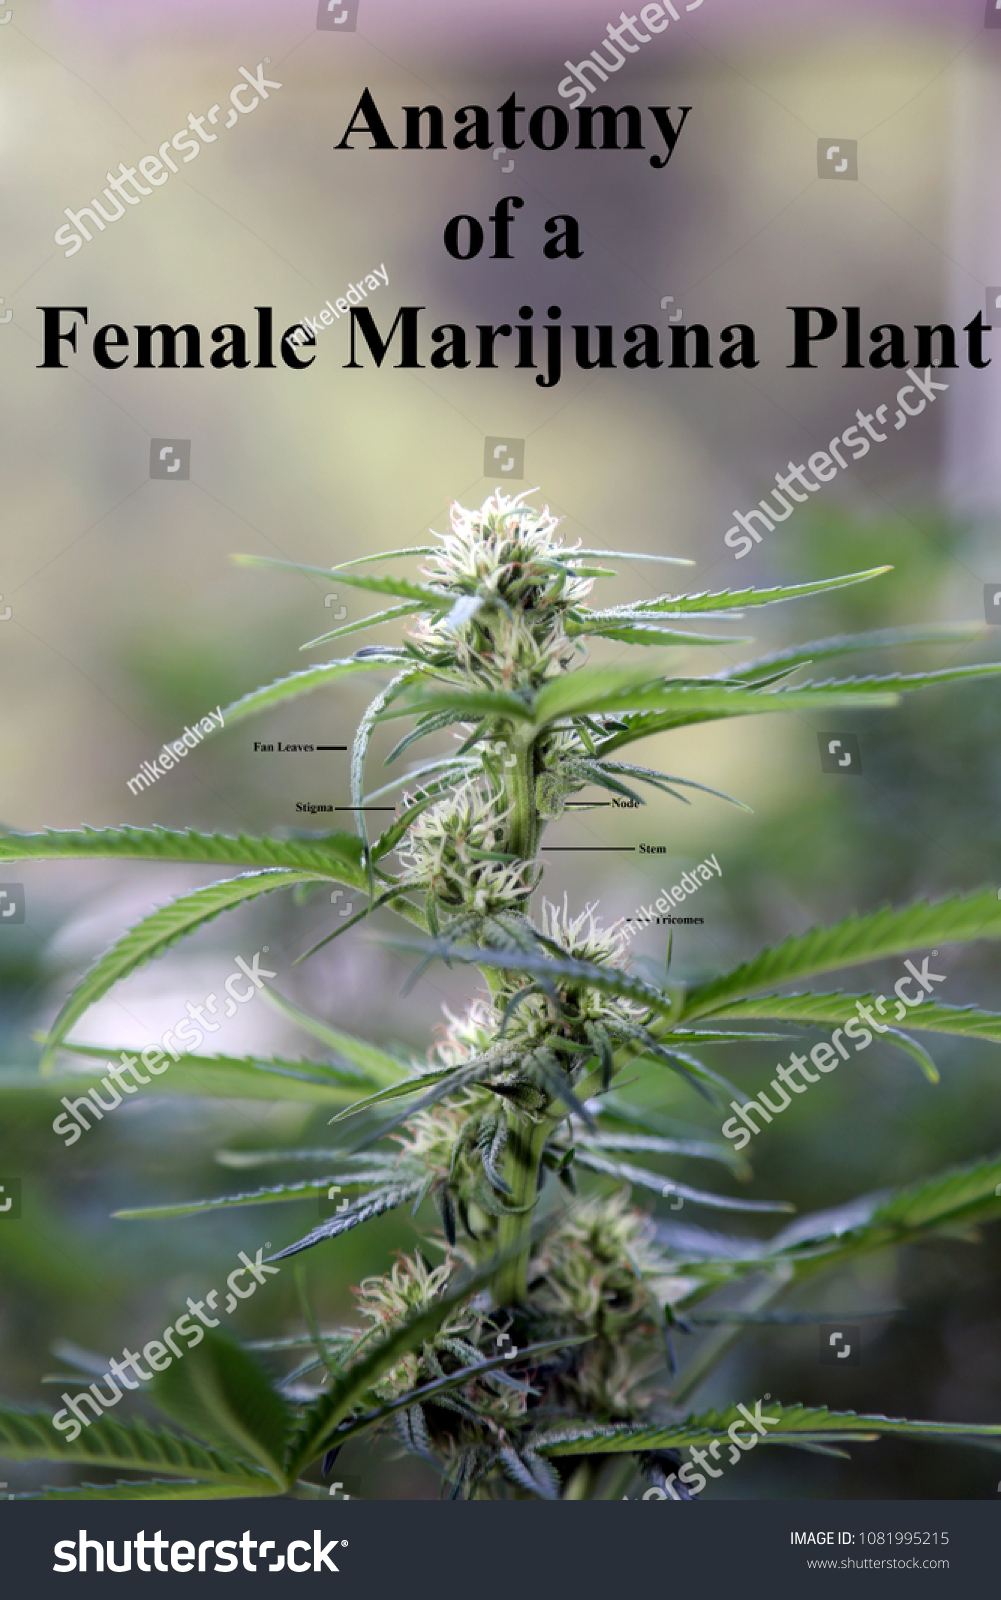 Anatomy Female Marijuana Plant Flower Stock Photo (100% Legal ...